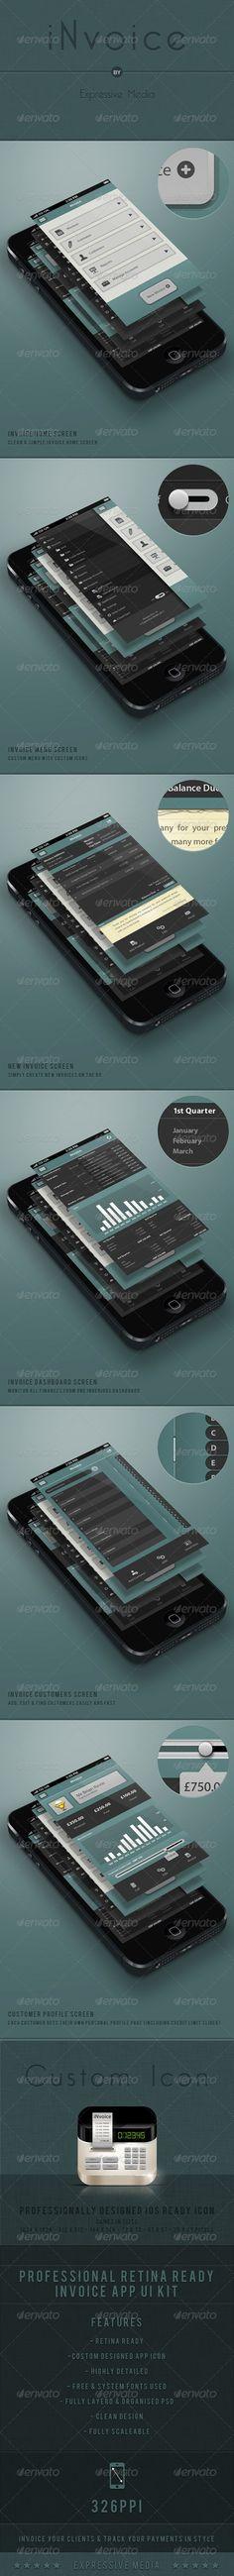 iNvoice Retina Mobile Interface